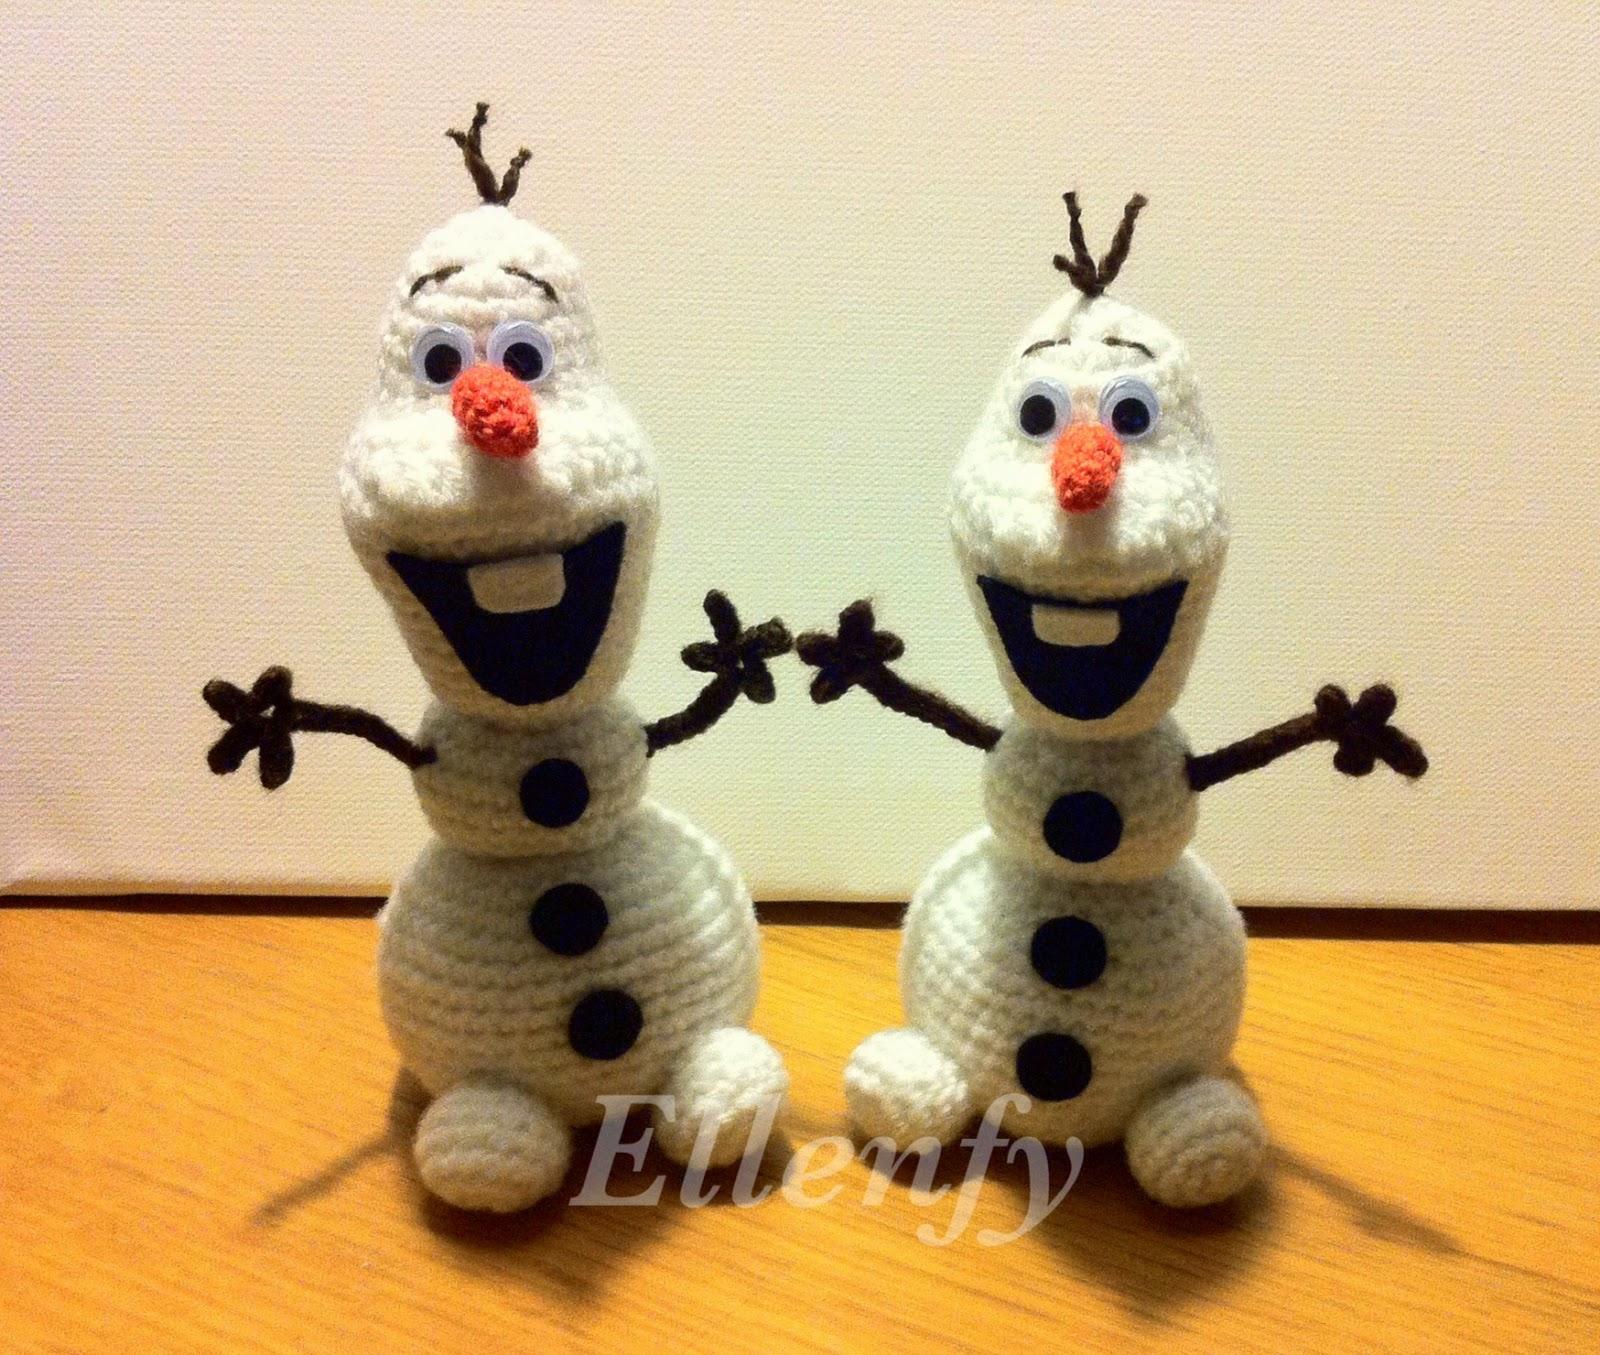 ~ Ellenfy ~: Olaf Amigurumi - Disney Frozen